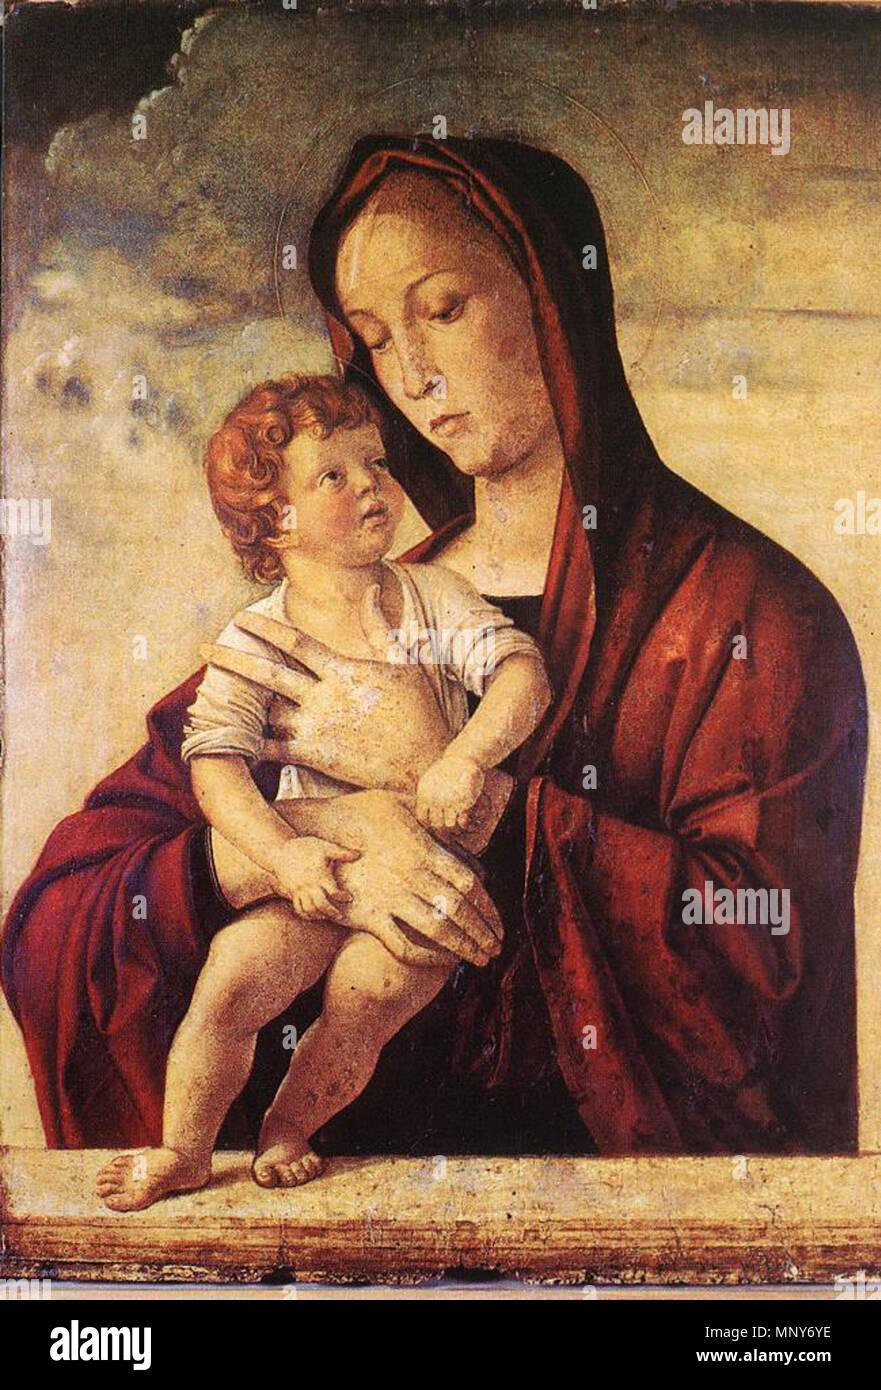 Bellini Nürnberg circa 1475 stock photos circa 1475 stock images alamy